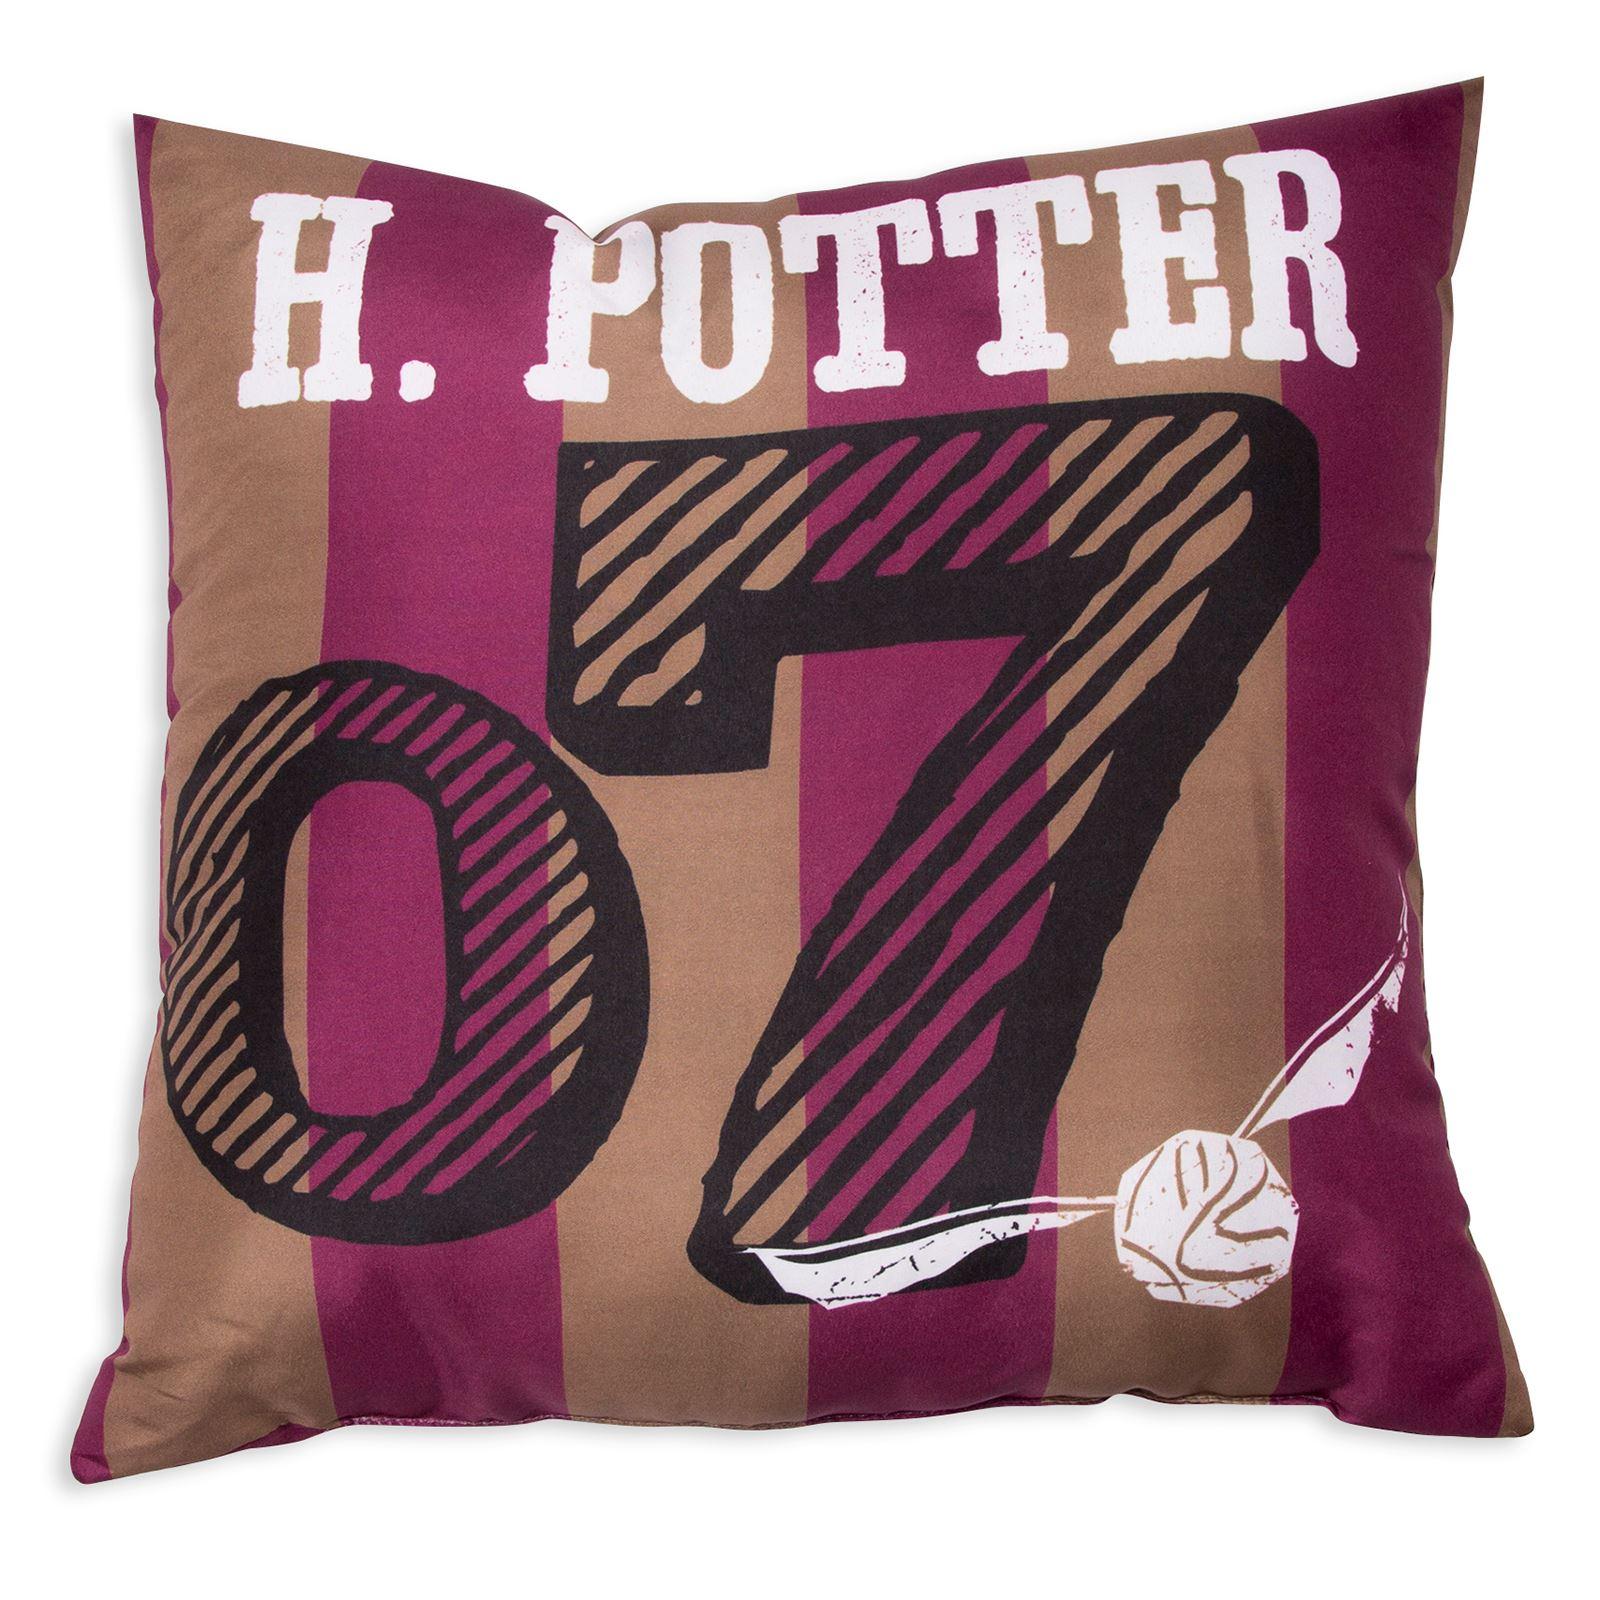 m dchen charakter kissen trolle pokemon paw patrol peppa harry potter mehr ebay. Black Bedroom Furniture Sets. Home Design Ideas